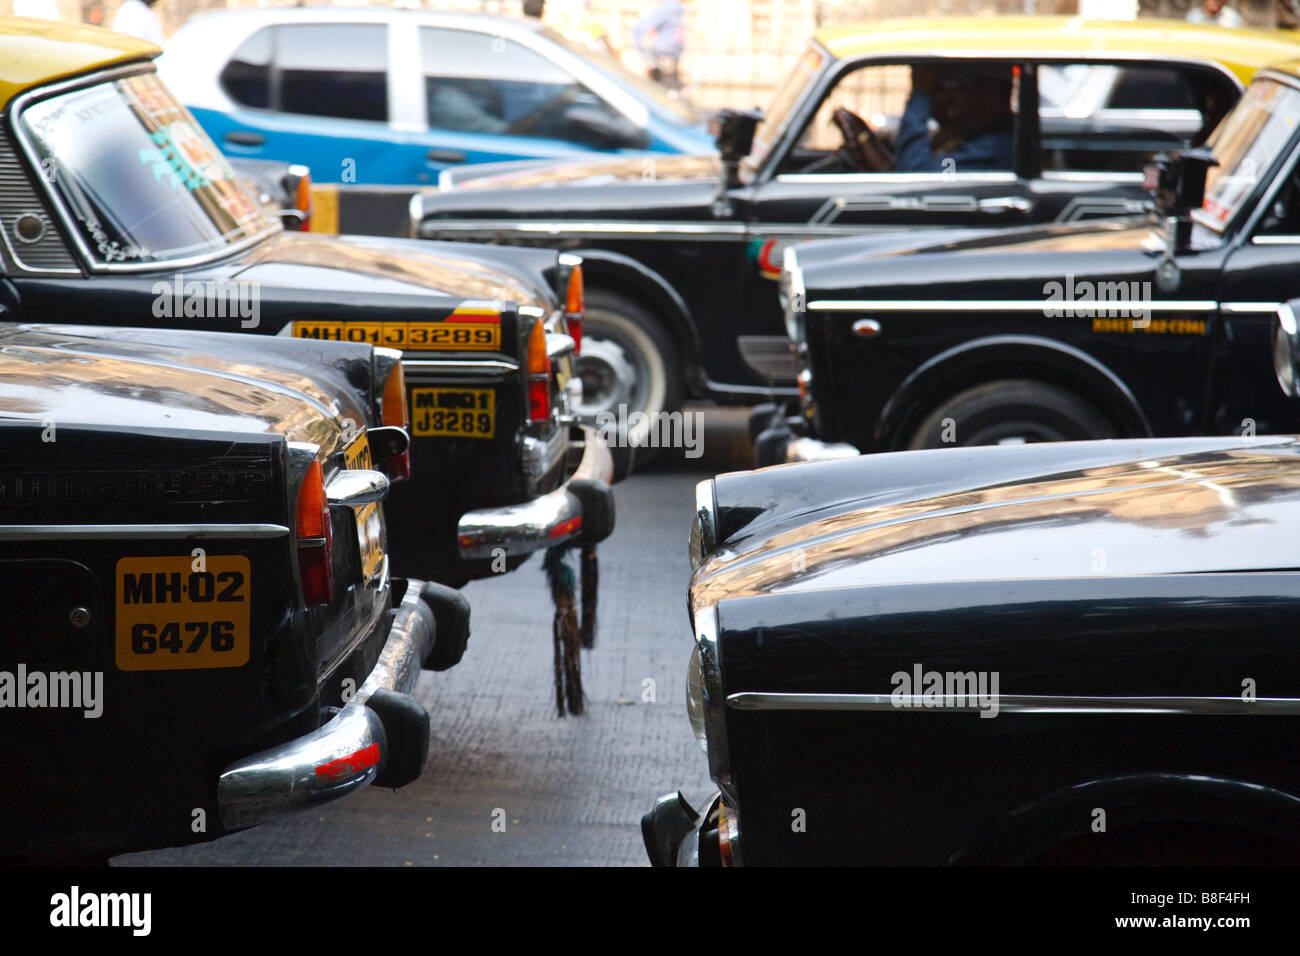 Premier Padmini taxi cars in the street of Mumbai, India - Stock Image